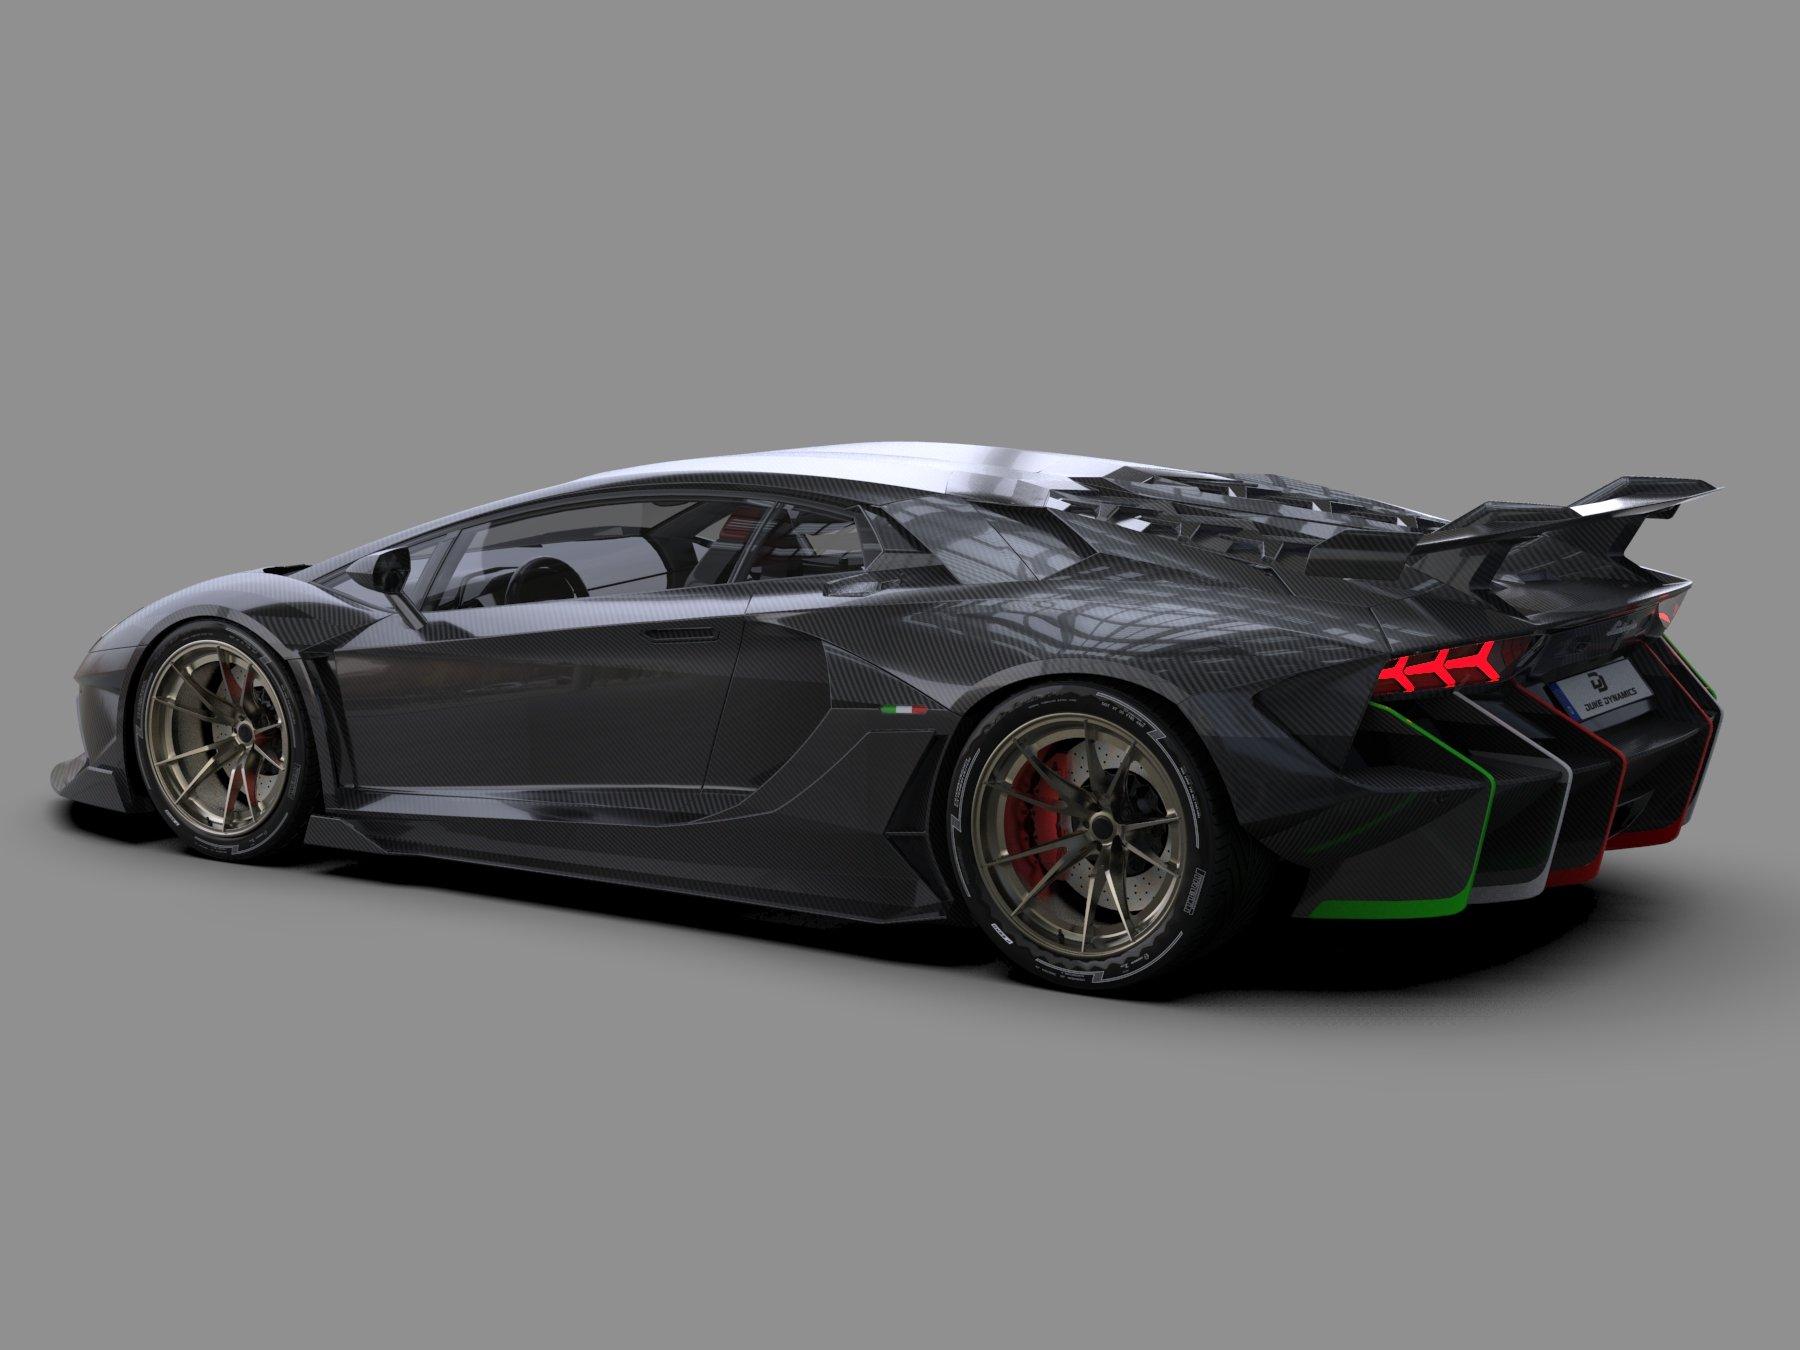 Lamborghini_Aventador_by_Duke_Dynamics_0008